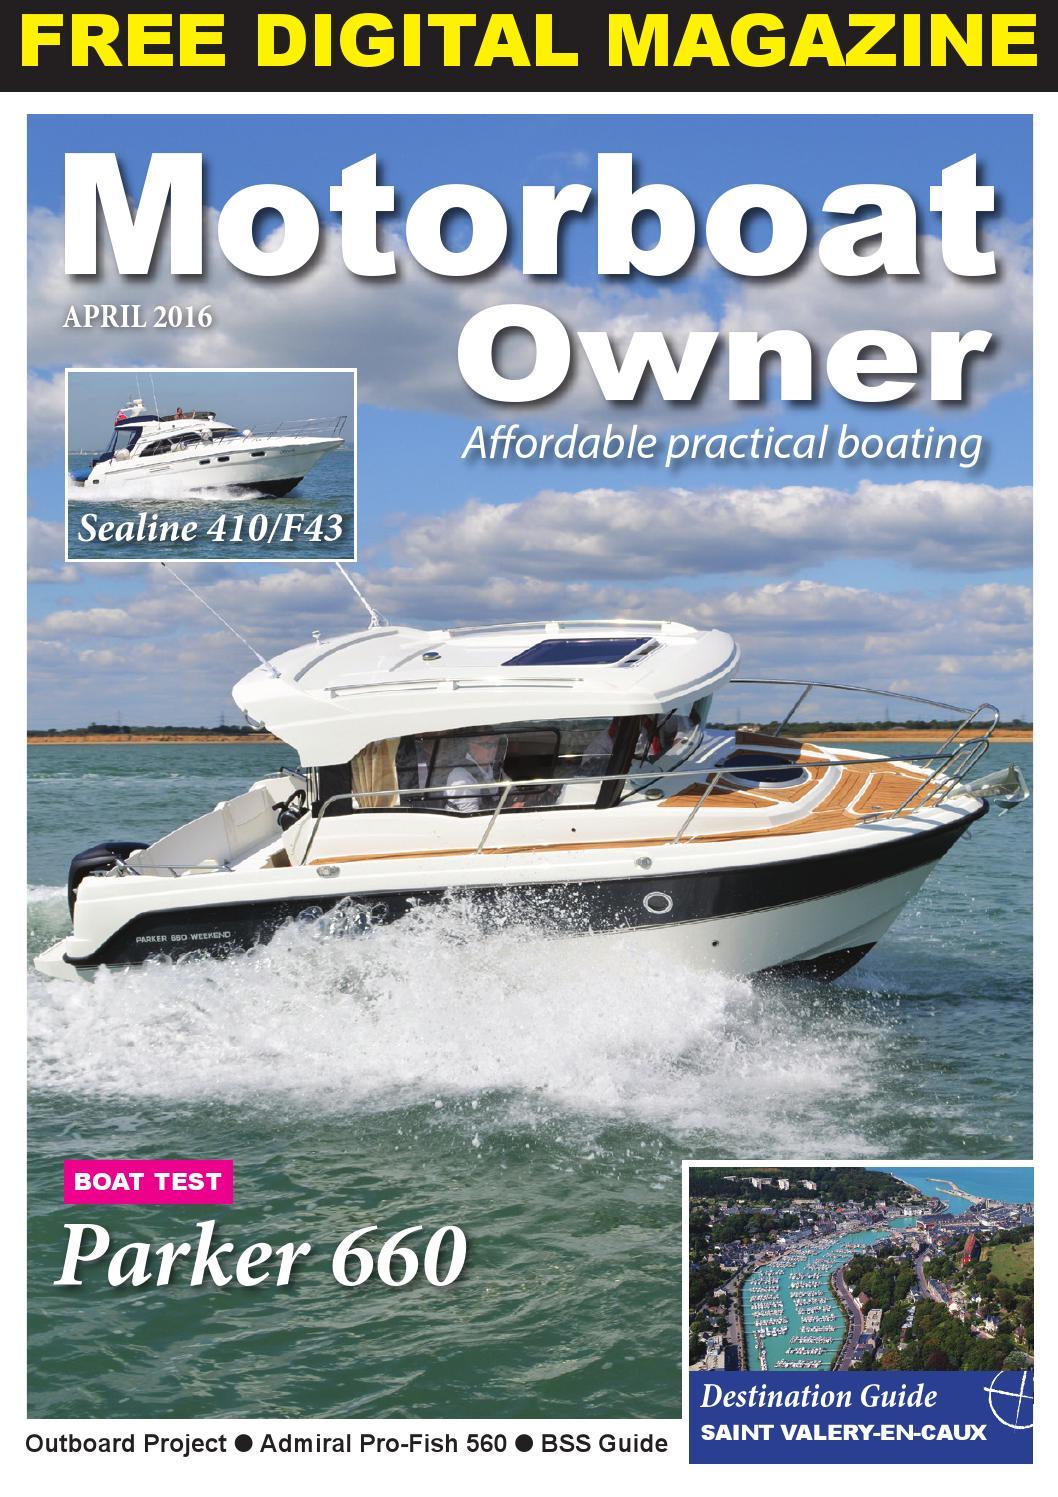 Motorboat Owner April 2016 By Digital Marine Media Ltd Issuu 2000 Yamaha T50 Outboard Wiring